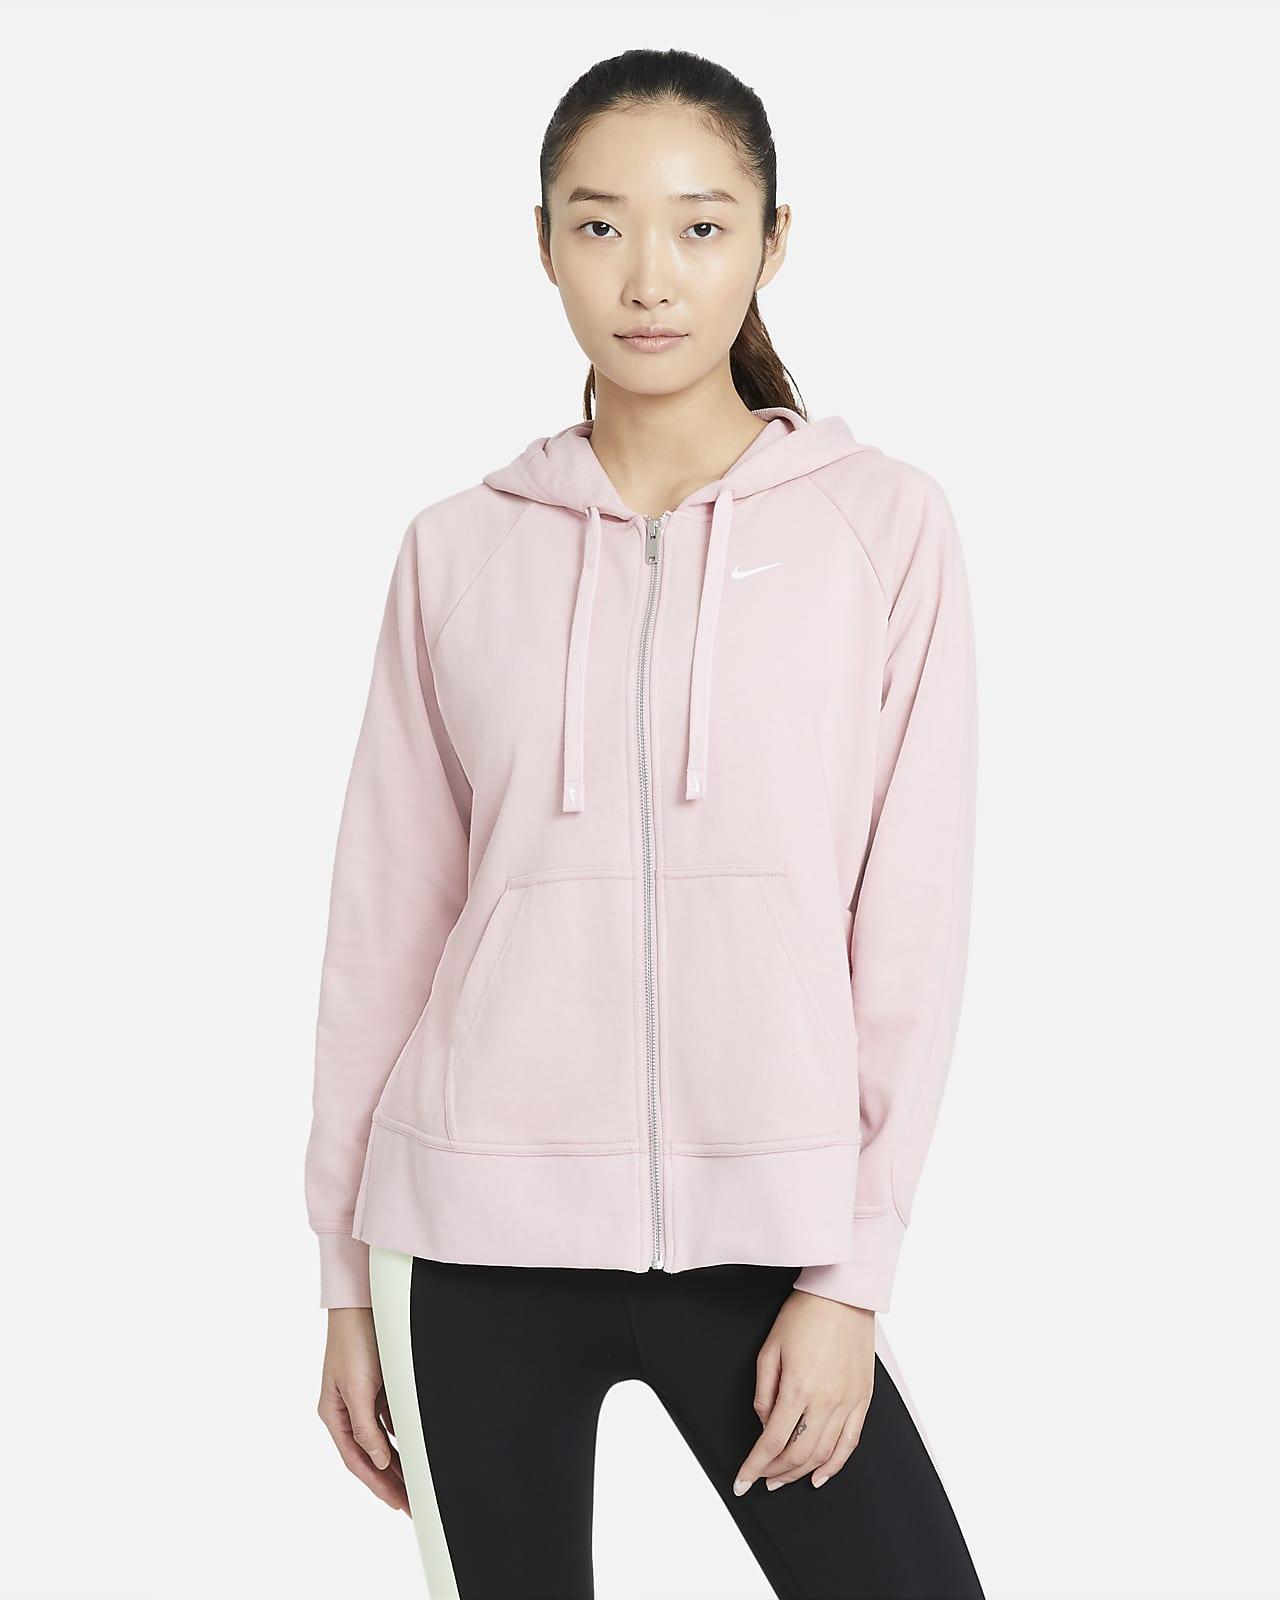 Nike Dri-FIT Get Fit Women's Full-Zip Training Hoodie